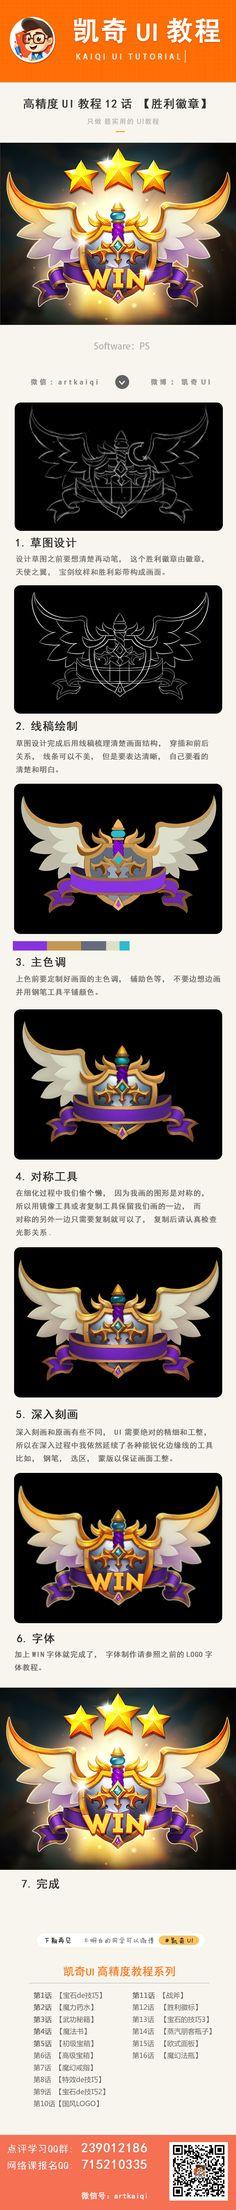 Cage UI Tutorial 12 words - victory badges